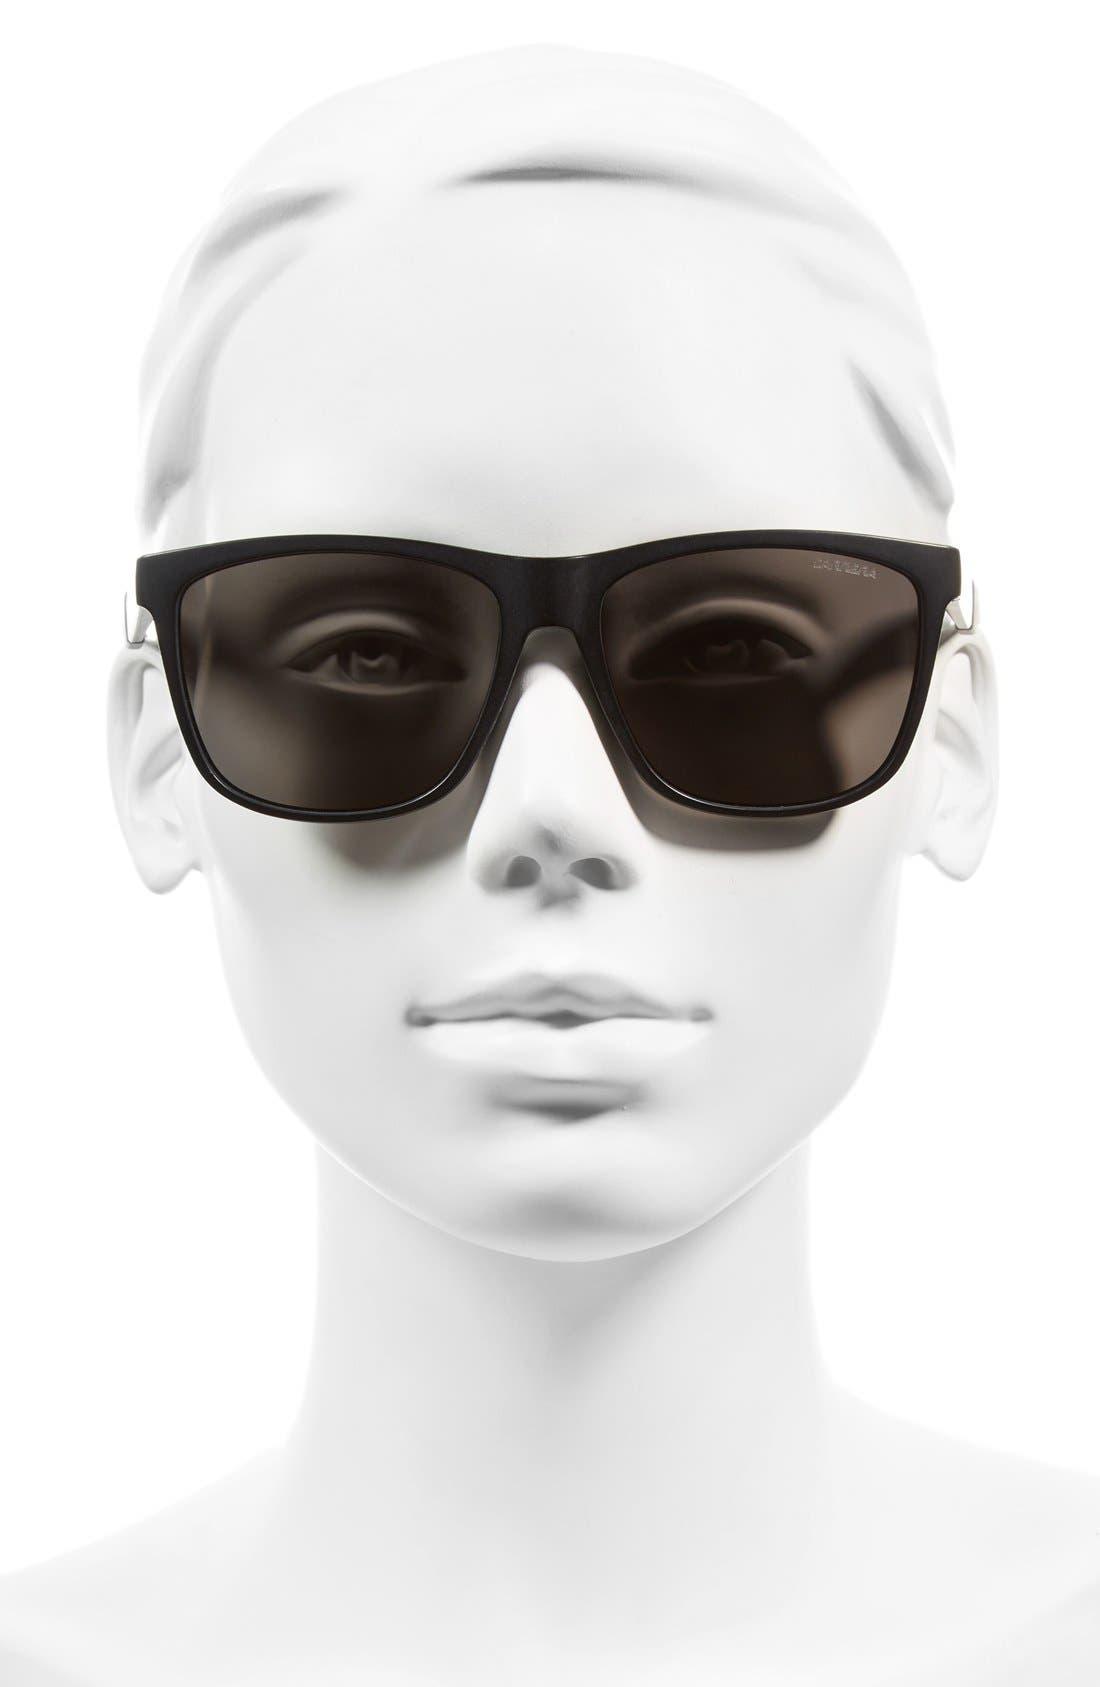 Carerra Eyewear 56mm Retro Polarized Sunglasses,                             Alternate thumbnail 2, color,                             001